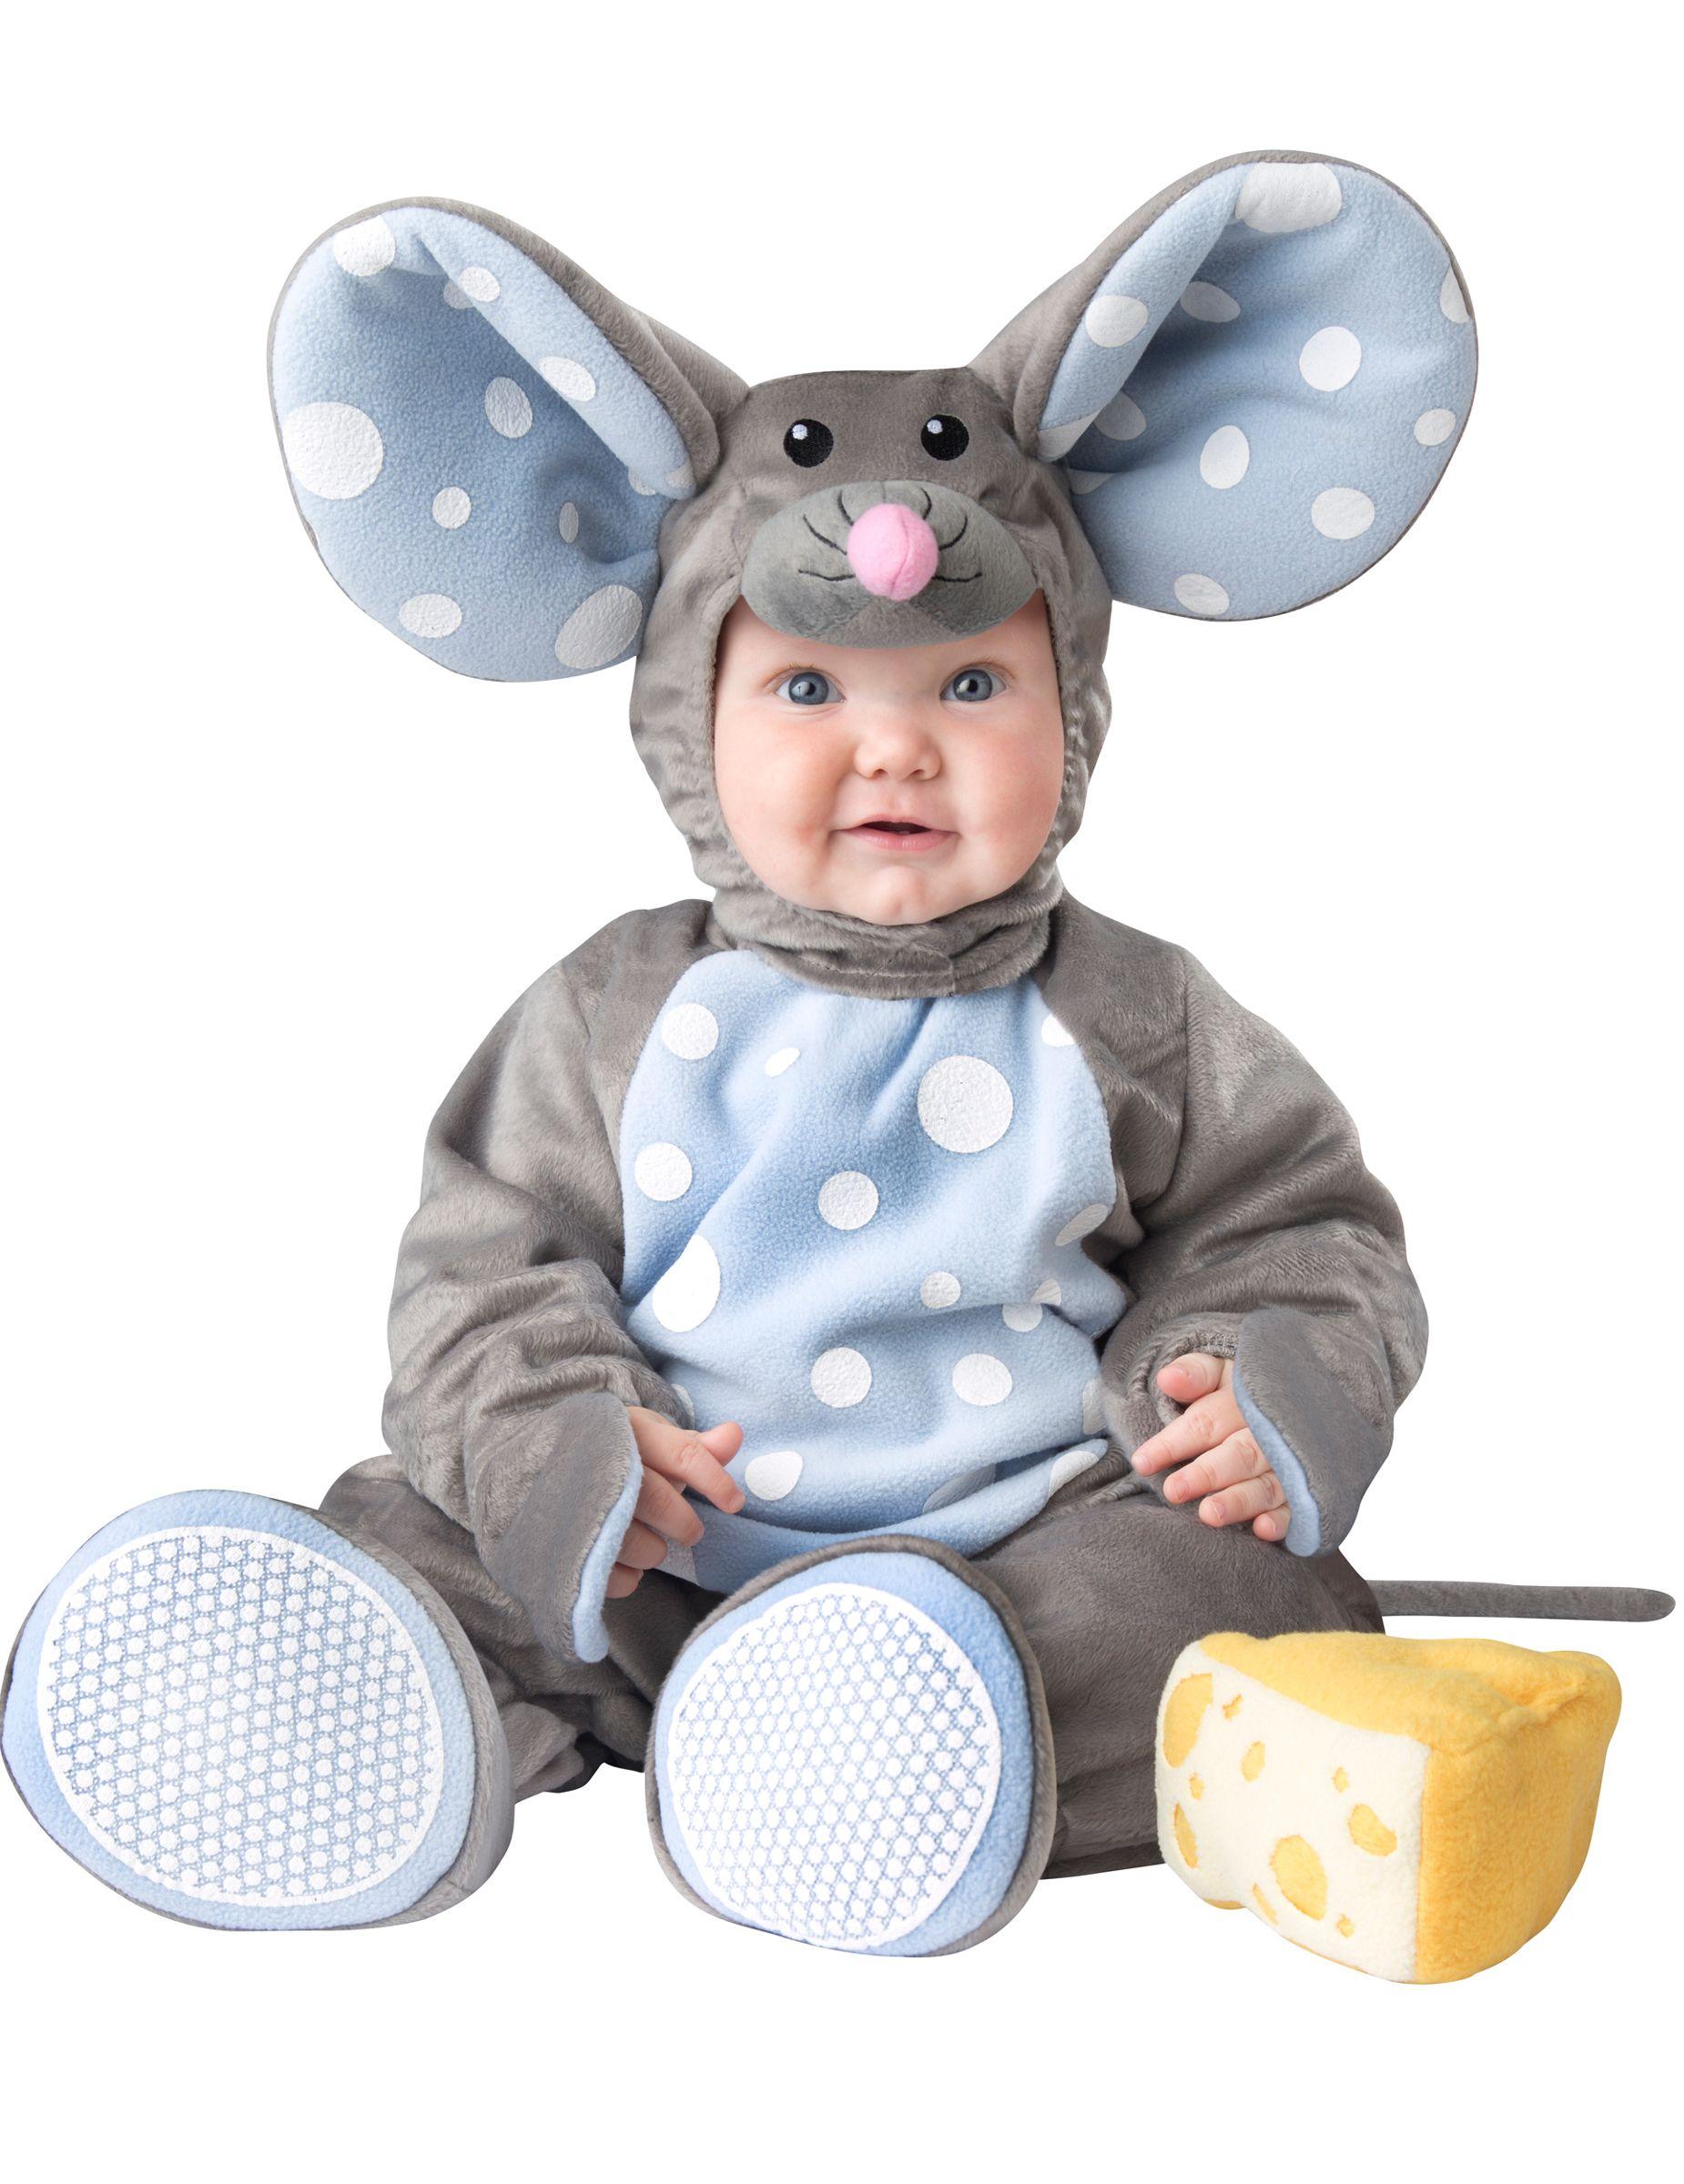 ce16cae3f Disfarce de rato para bebé - Luxo  Este disfarce de rato para bebé é  composto de uma combinação